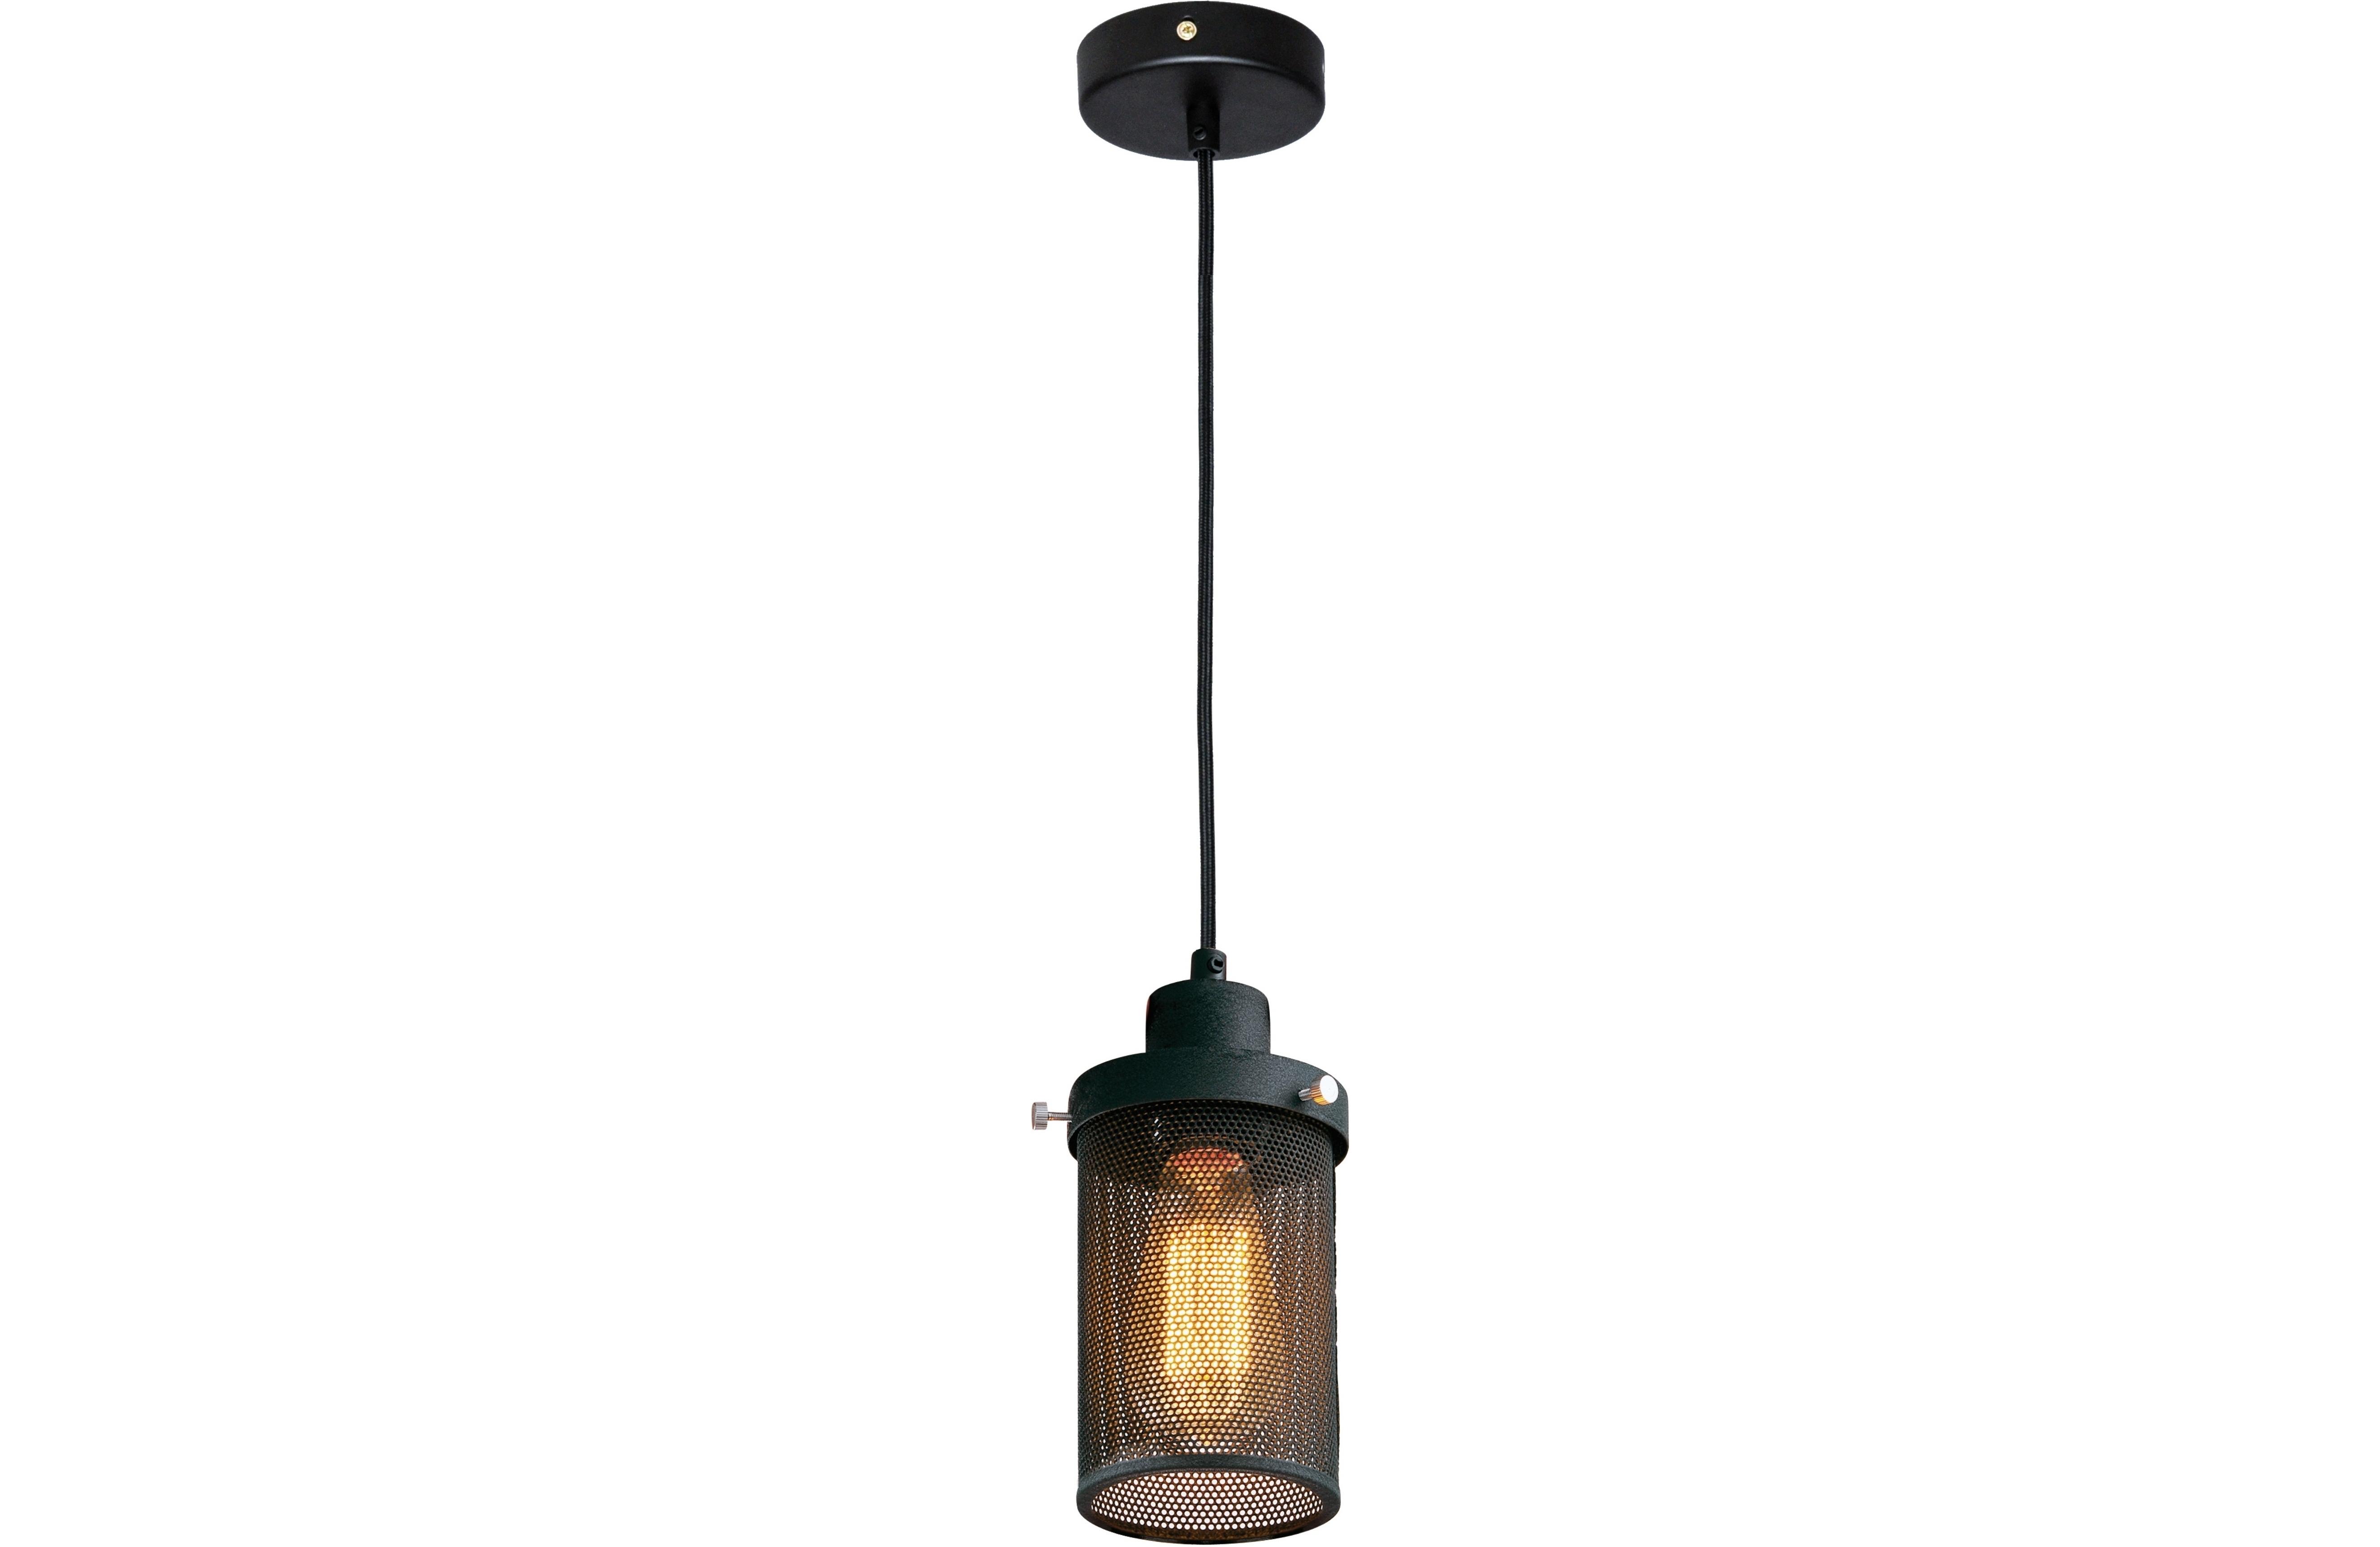 Подвесной светильникПодвесные светильники<br>&amp;lt;div&amp;gt;Цоколь: E27&amp;lt;/div&amp;gt;&amp;lt;div&amp;gt;Мощность ламп: 60W&amp;lt;/div&amp;gt;&amp;lt;div&amp;gt;Количество лампочек: 1&amp;lt;/div&amp;gt;<br><br>Material: Металл<br>Width см: None<br>Height см: 120<br>Diameter см: 11